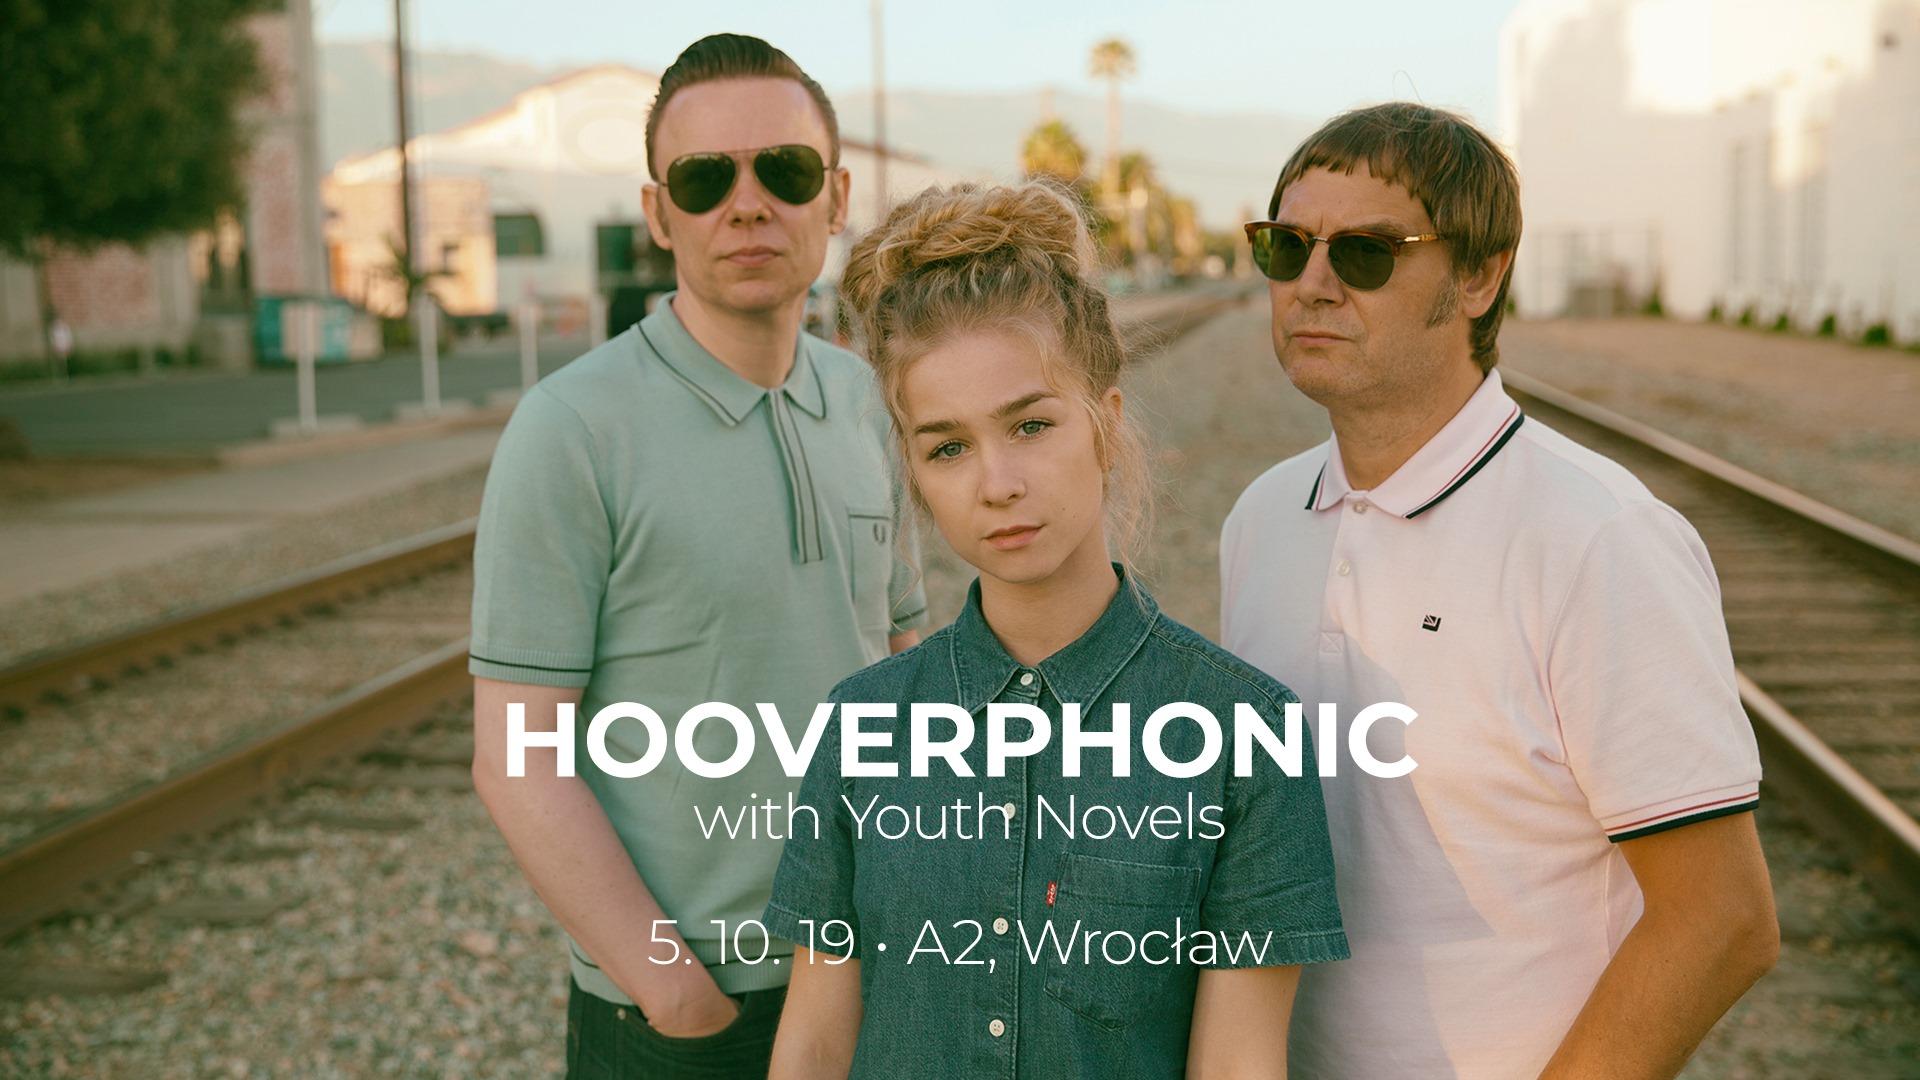 Hooverphonic 5.10   A2, Wrocław